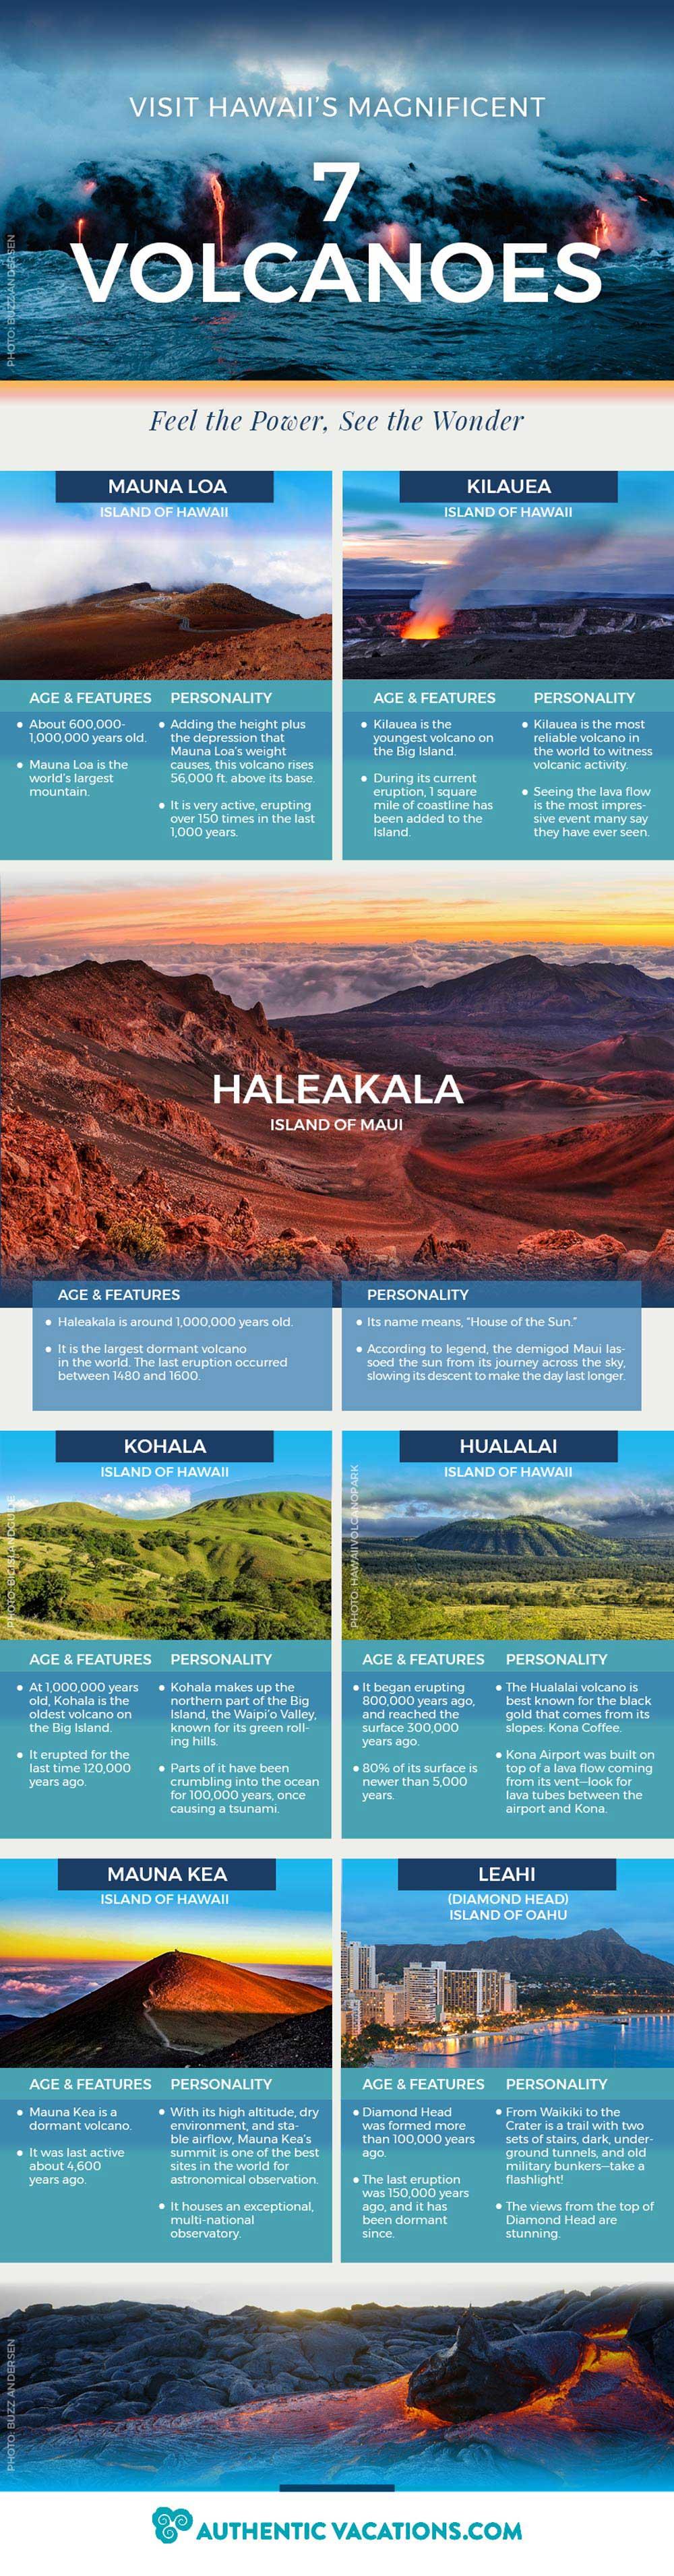 Visit Hawaii's Magnificent 7 Volcanoes